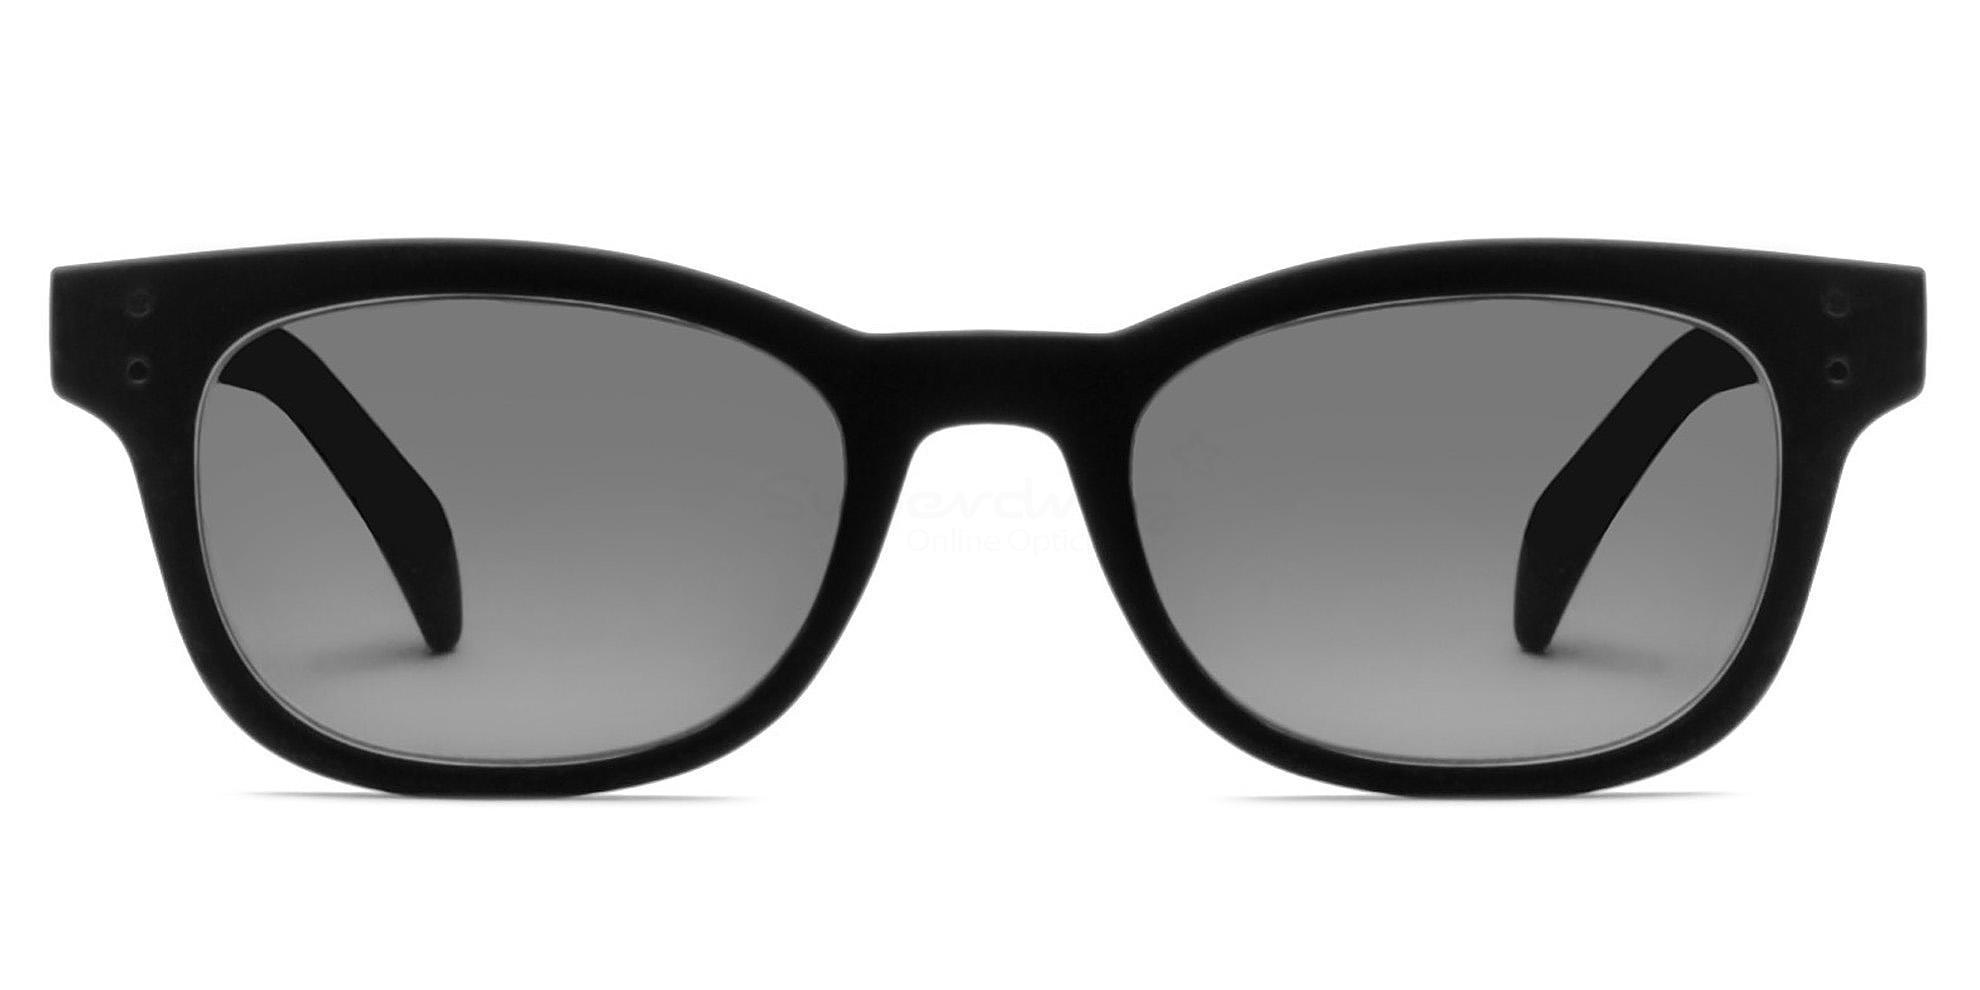 C02 Polarized Grey 2249 - Matte Black (Polarized) Sunglasses, Neon